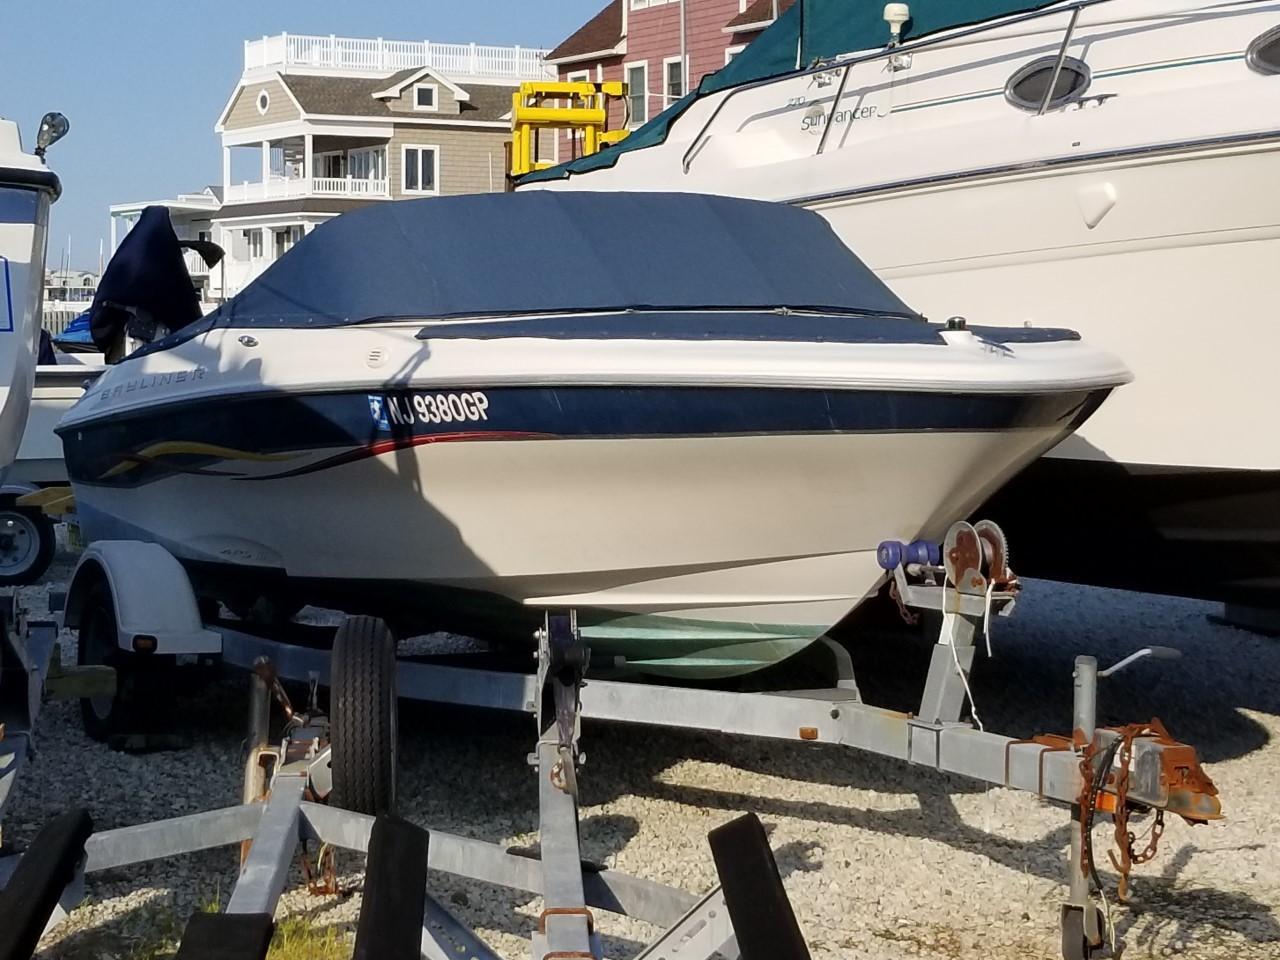 2001 bayliner 185 capri power boat for sale www yachtworld com rh yachtworld com 1996 bayliner [ 1280 x 960 Pixel ]